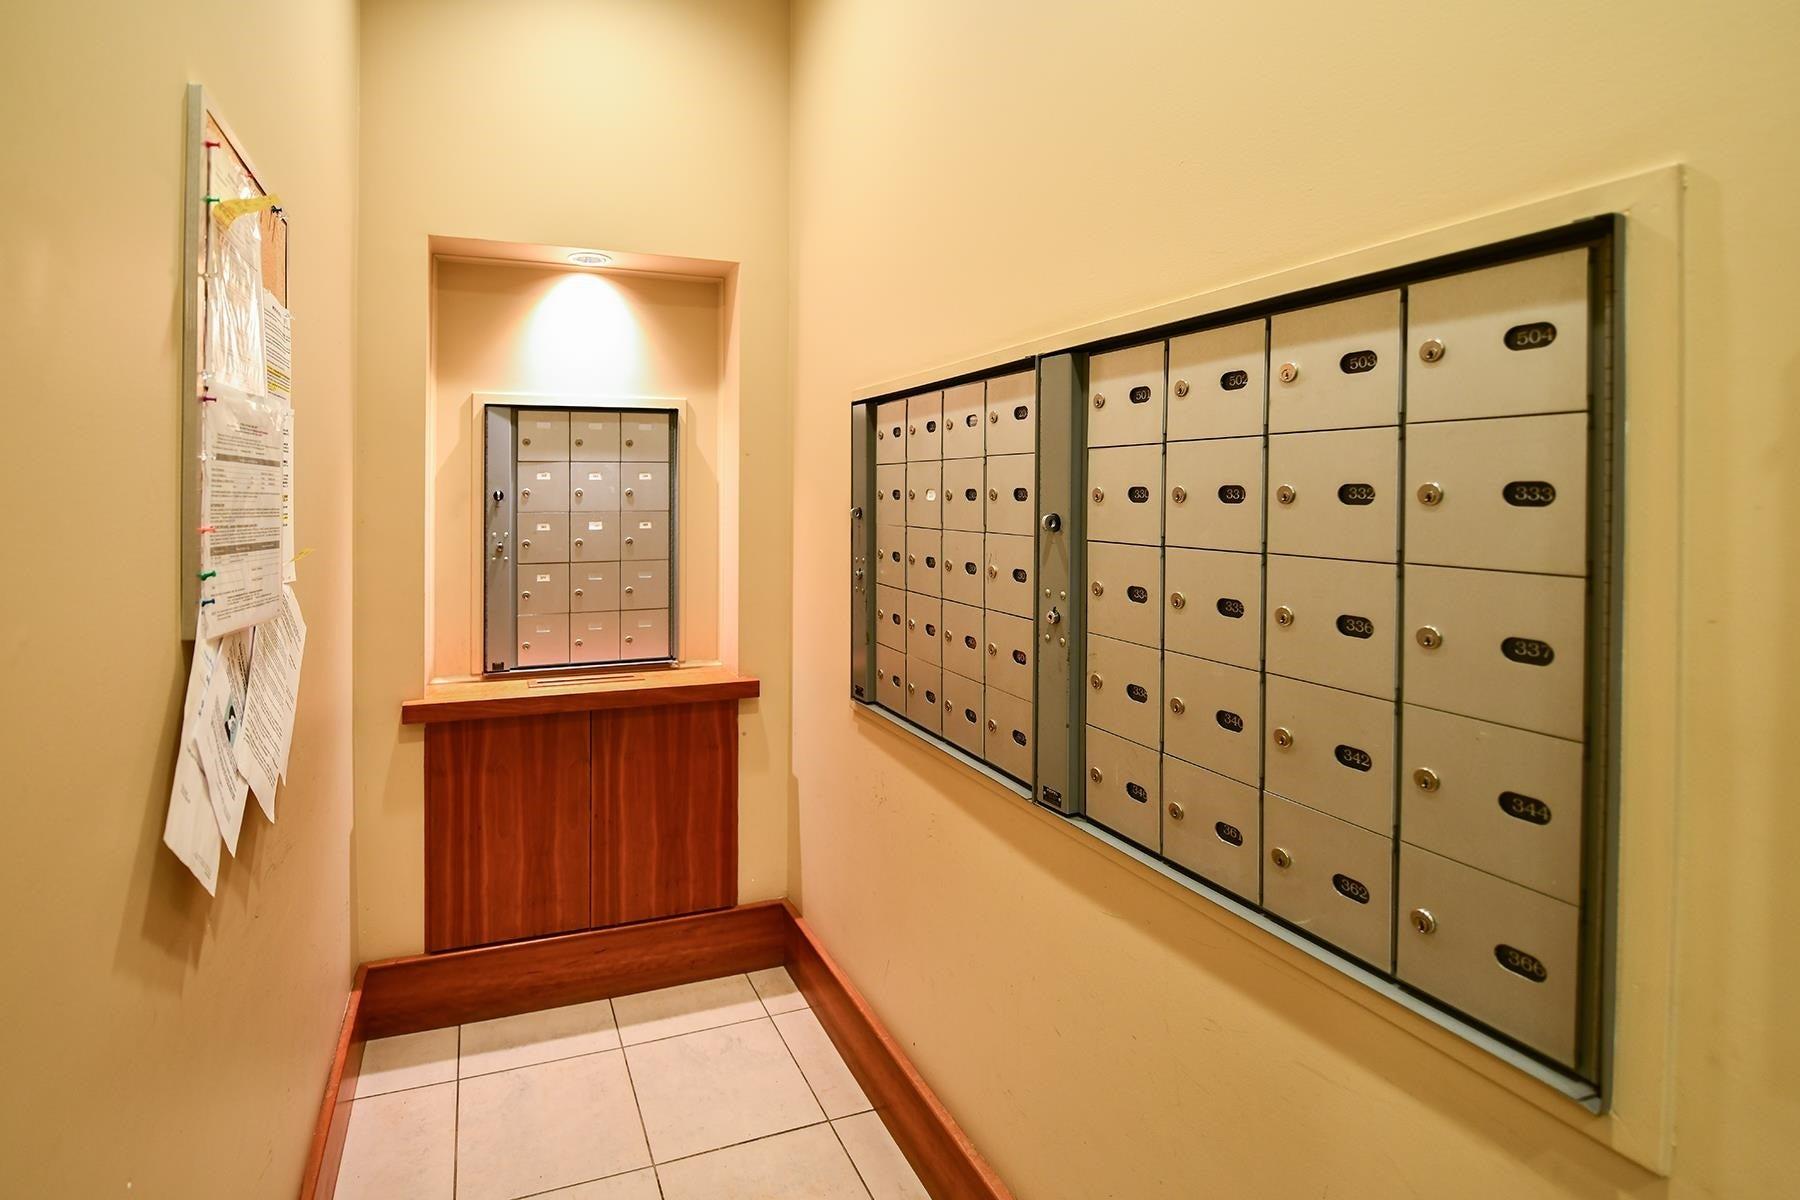 204 5790 EAST BOULEVARD - Kerrisdale Apartment/Condo for sale, 3 Bedrooms (R2604138) - #25